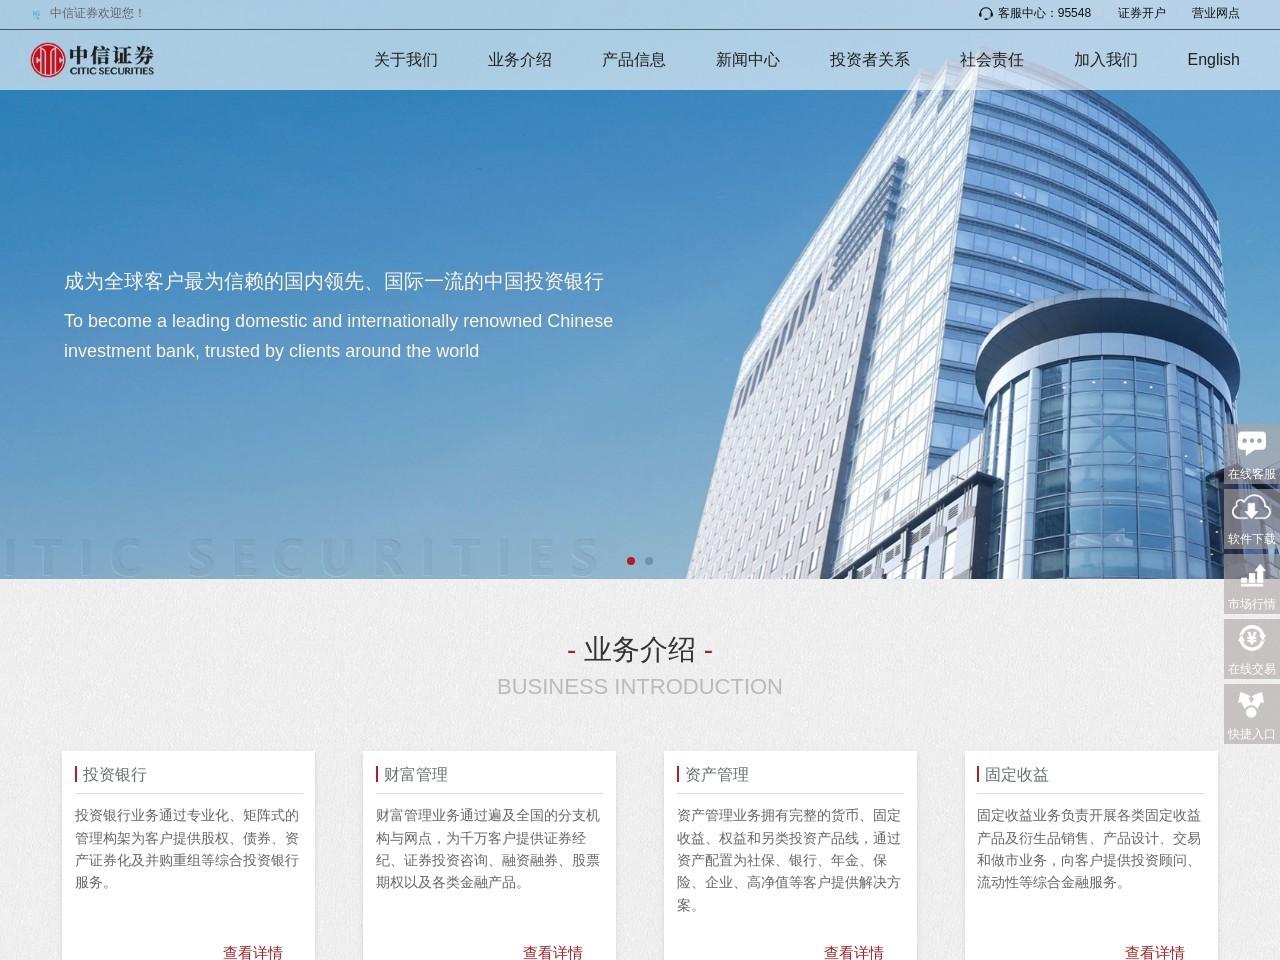 中信证券 CITIC Securities